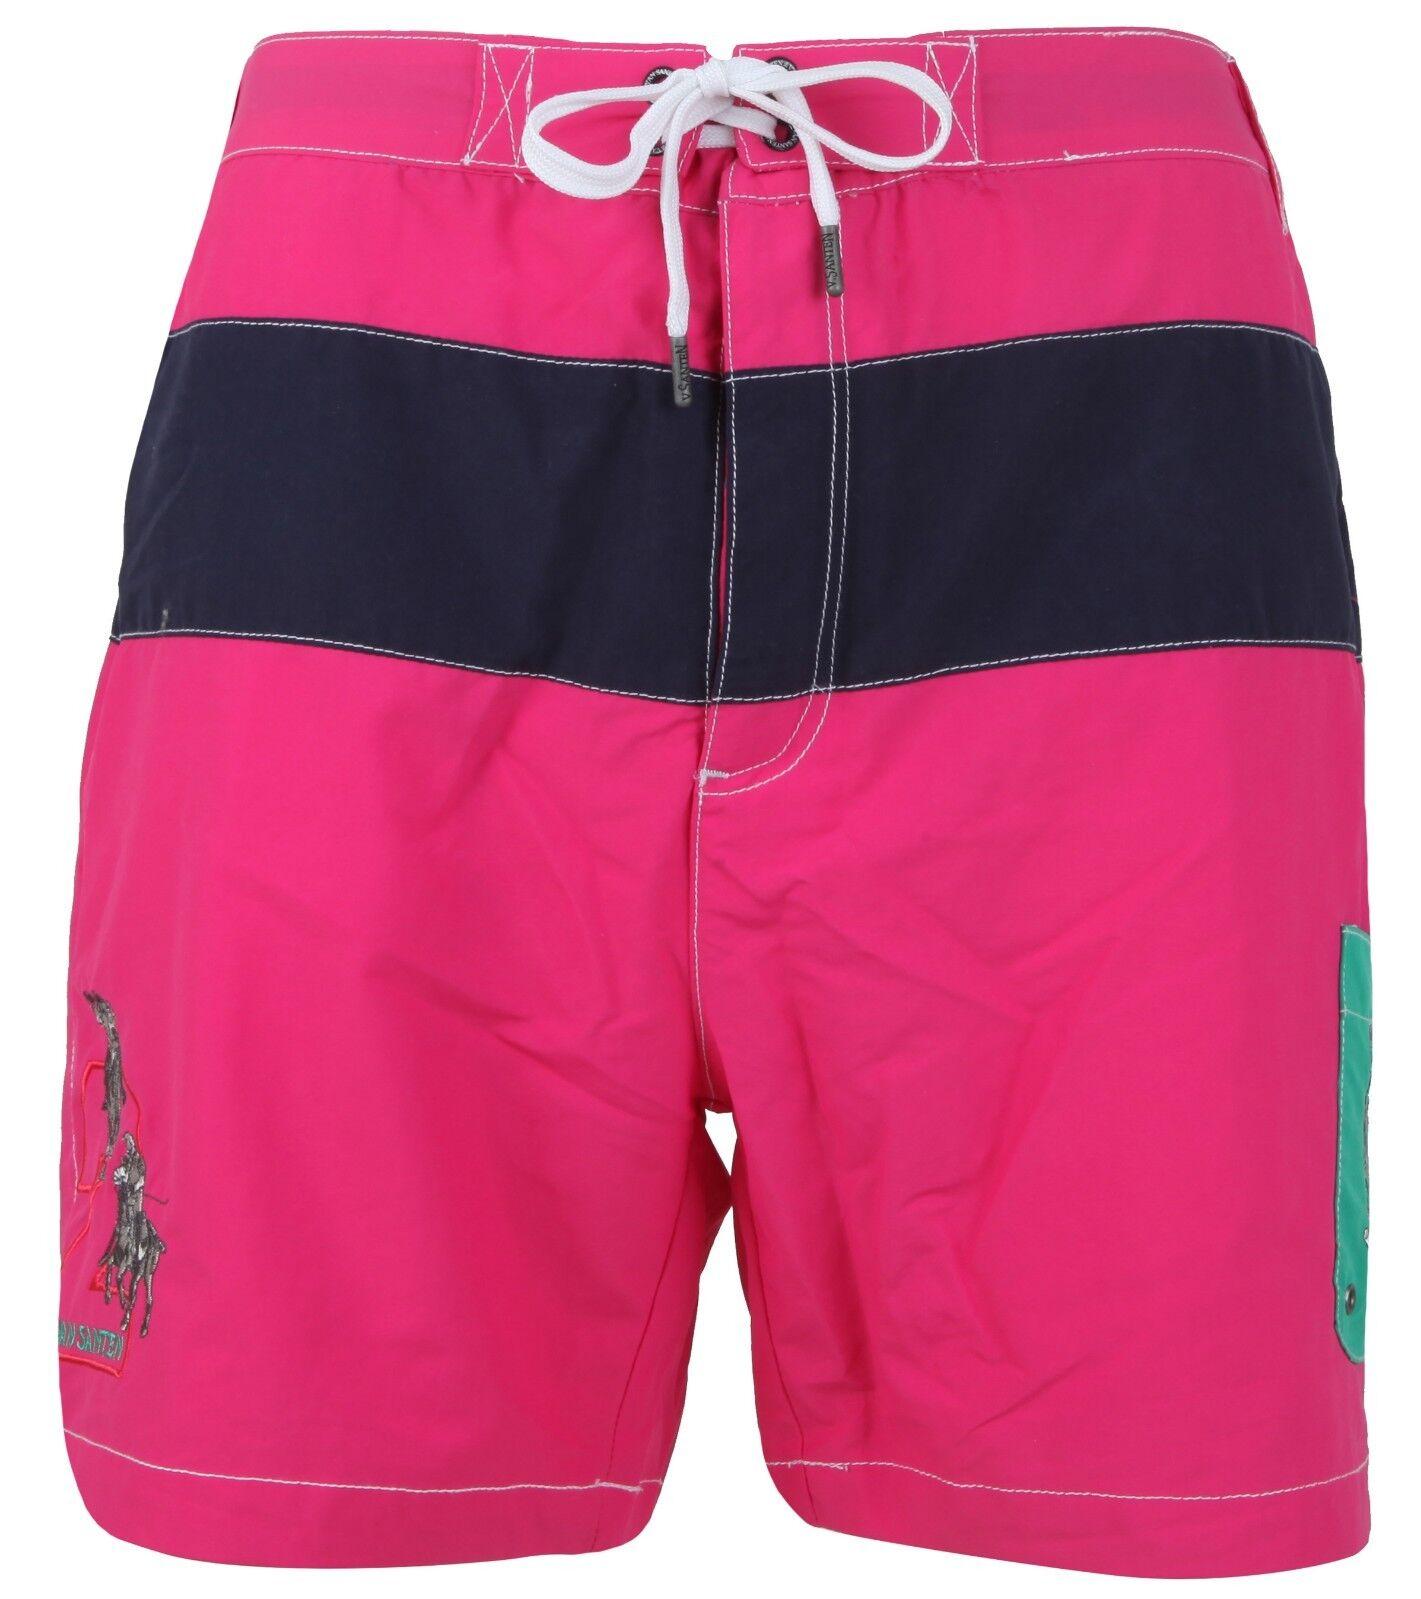 VAN SANTEN & VAN SANTEN Badehose Shorts Bermuda Swimming Trunks Gr. L pink Pink